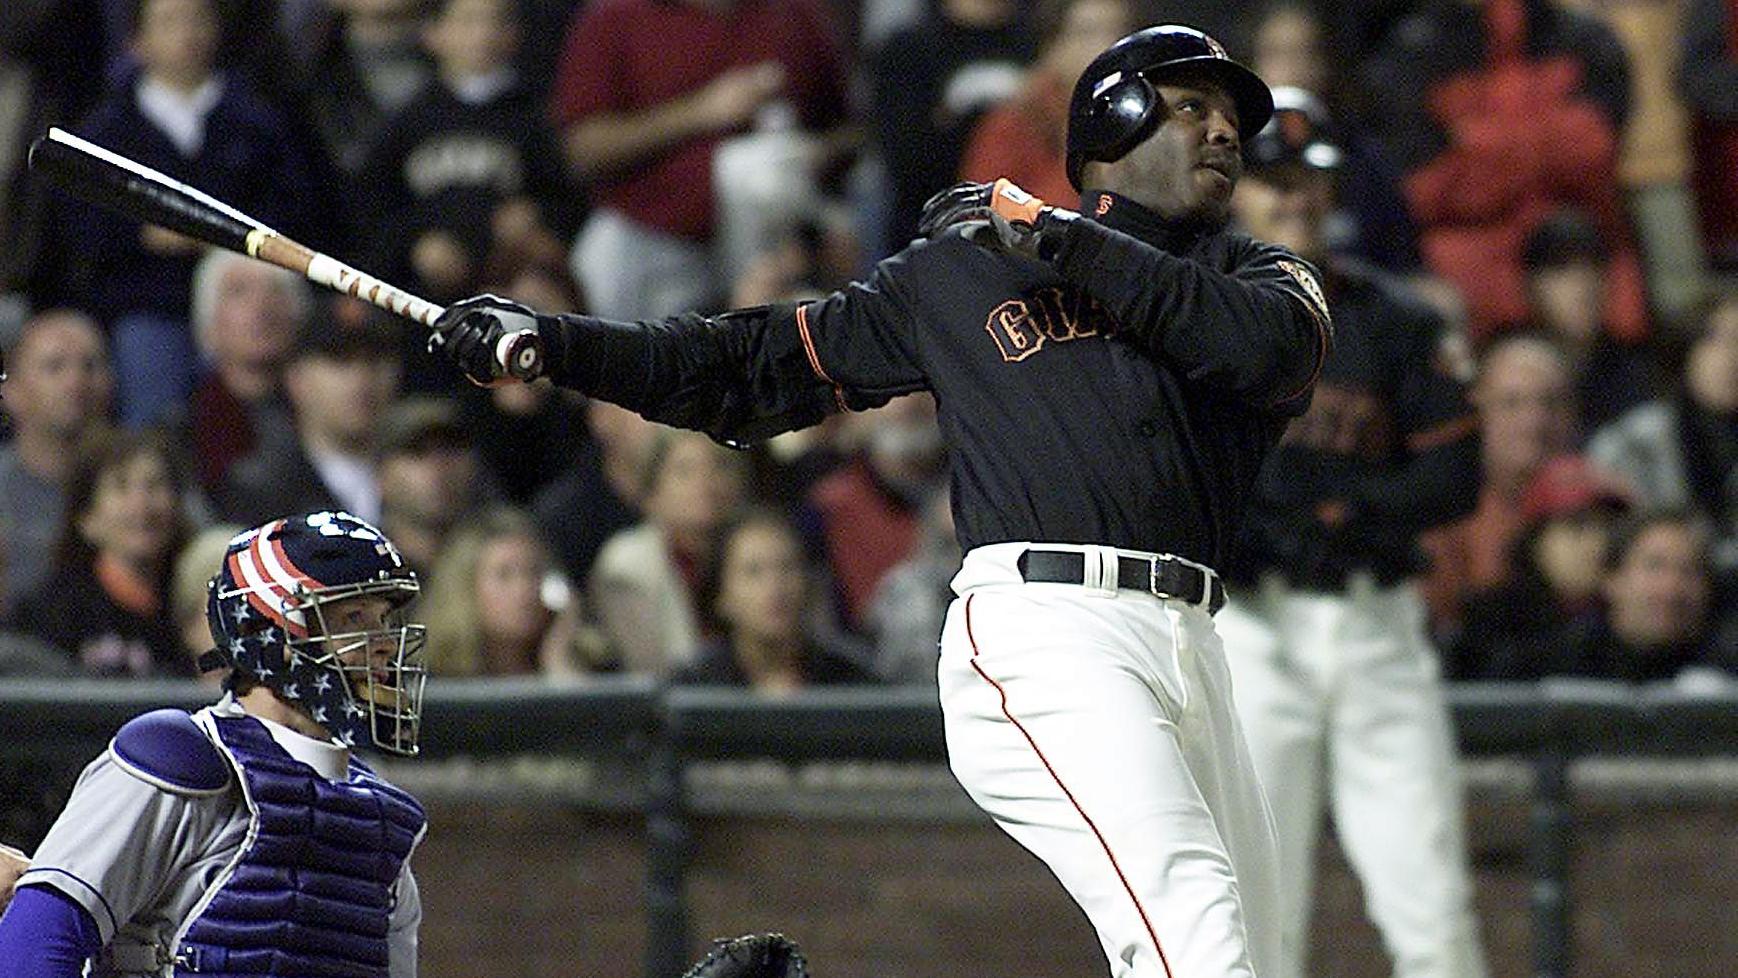 San Francisco Giants slugger Barry Bonds follows t